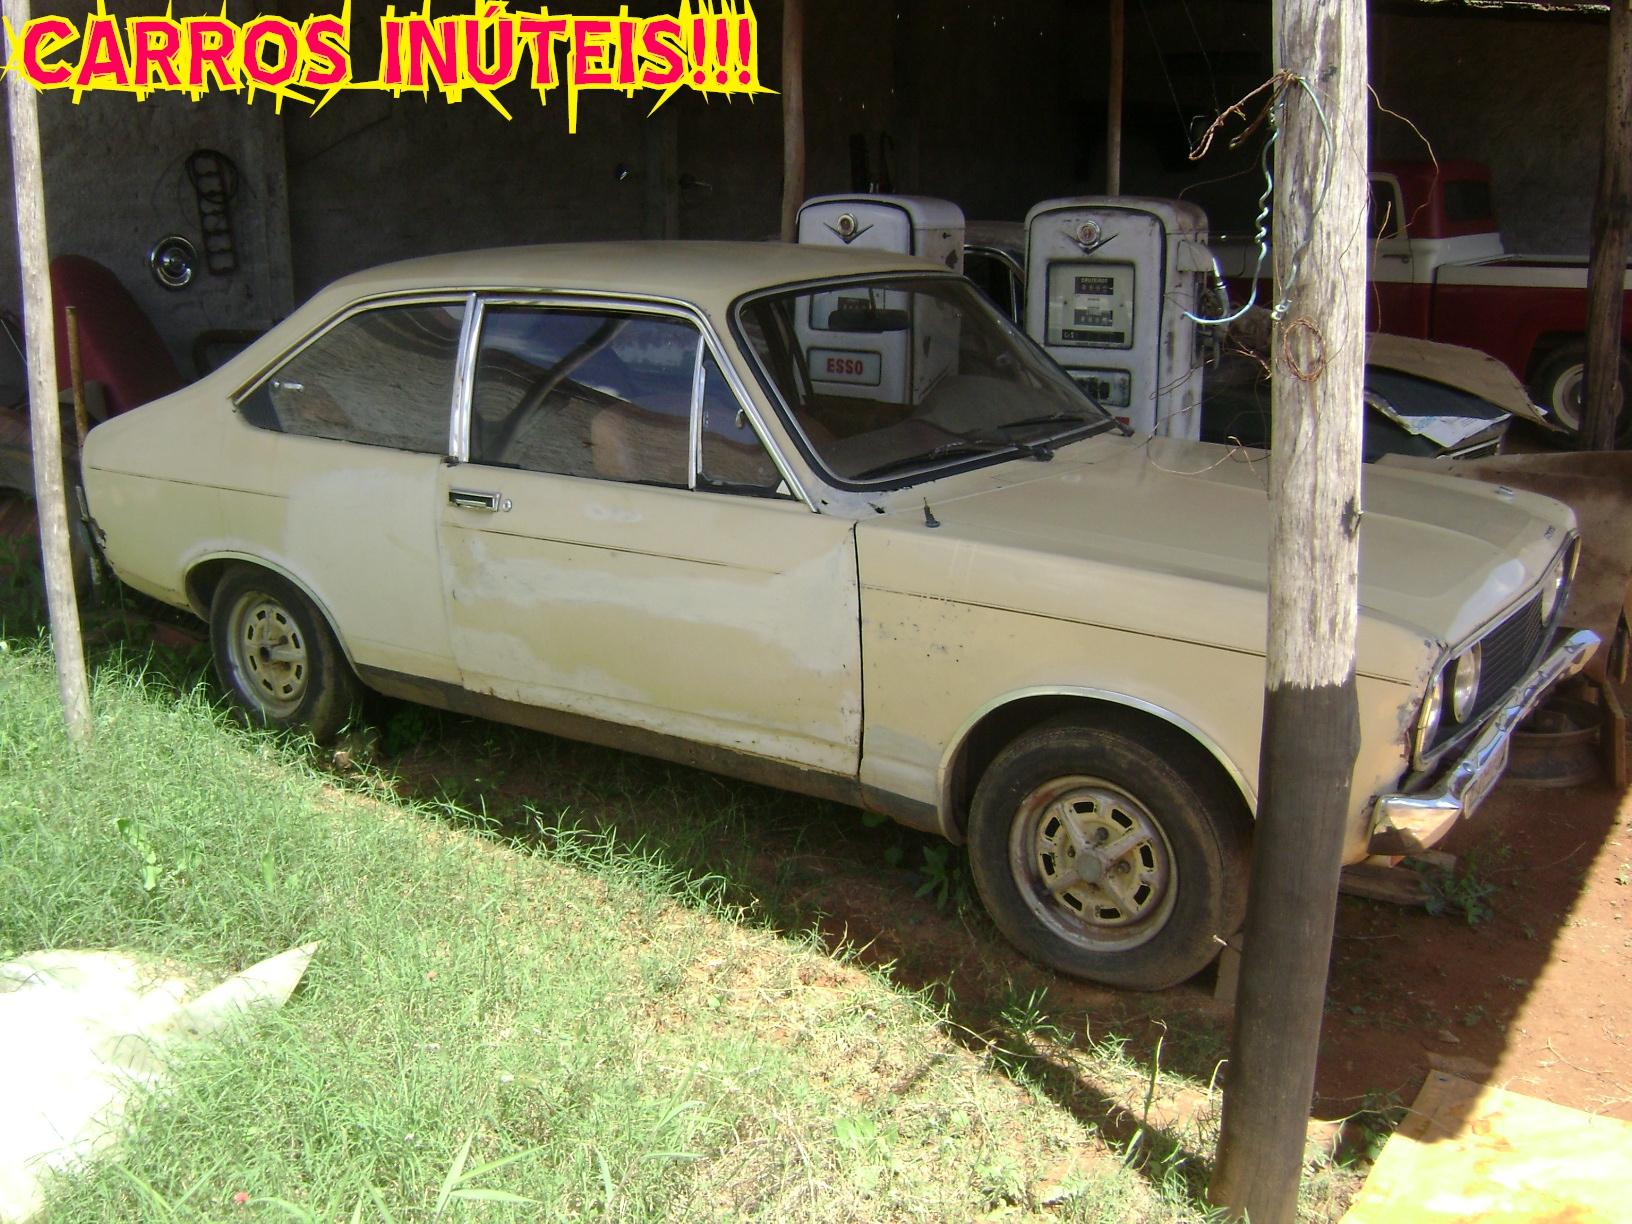 guilherme-gomes-polara-mg-1 Dodge Polara GL 1977 à venda!